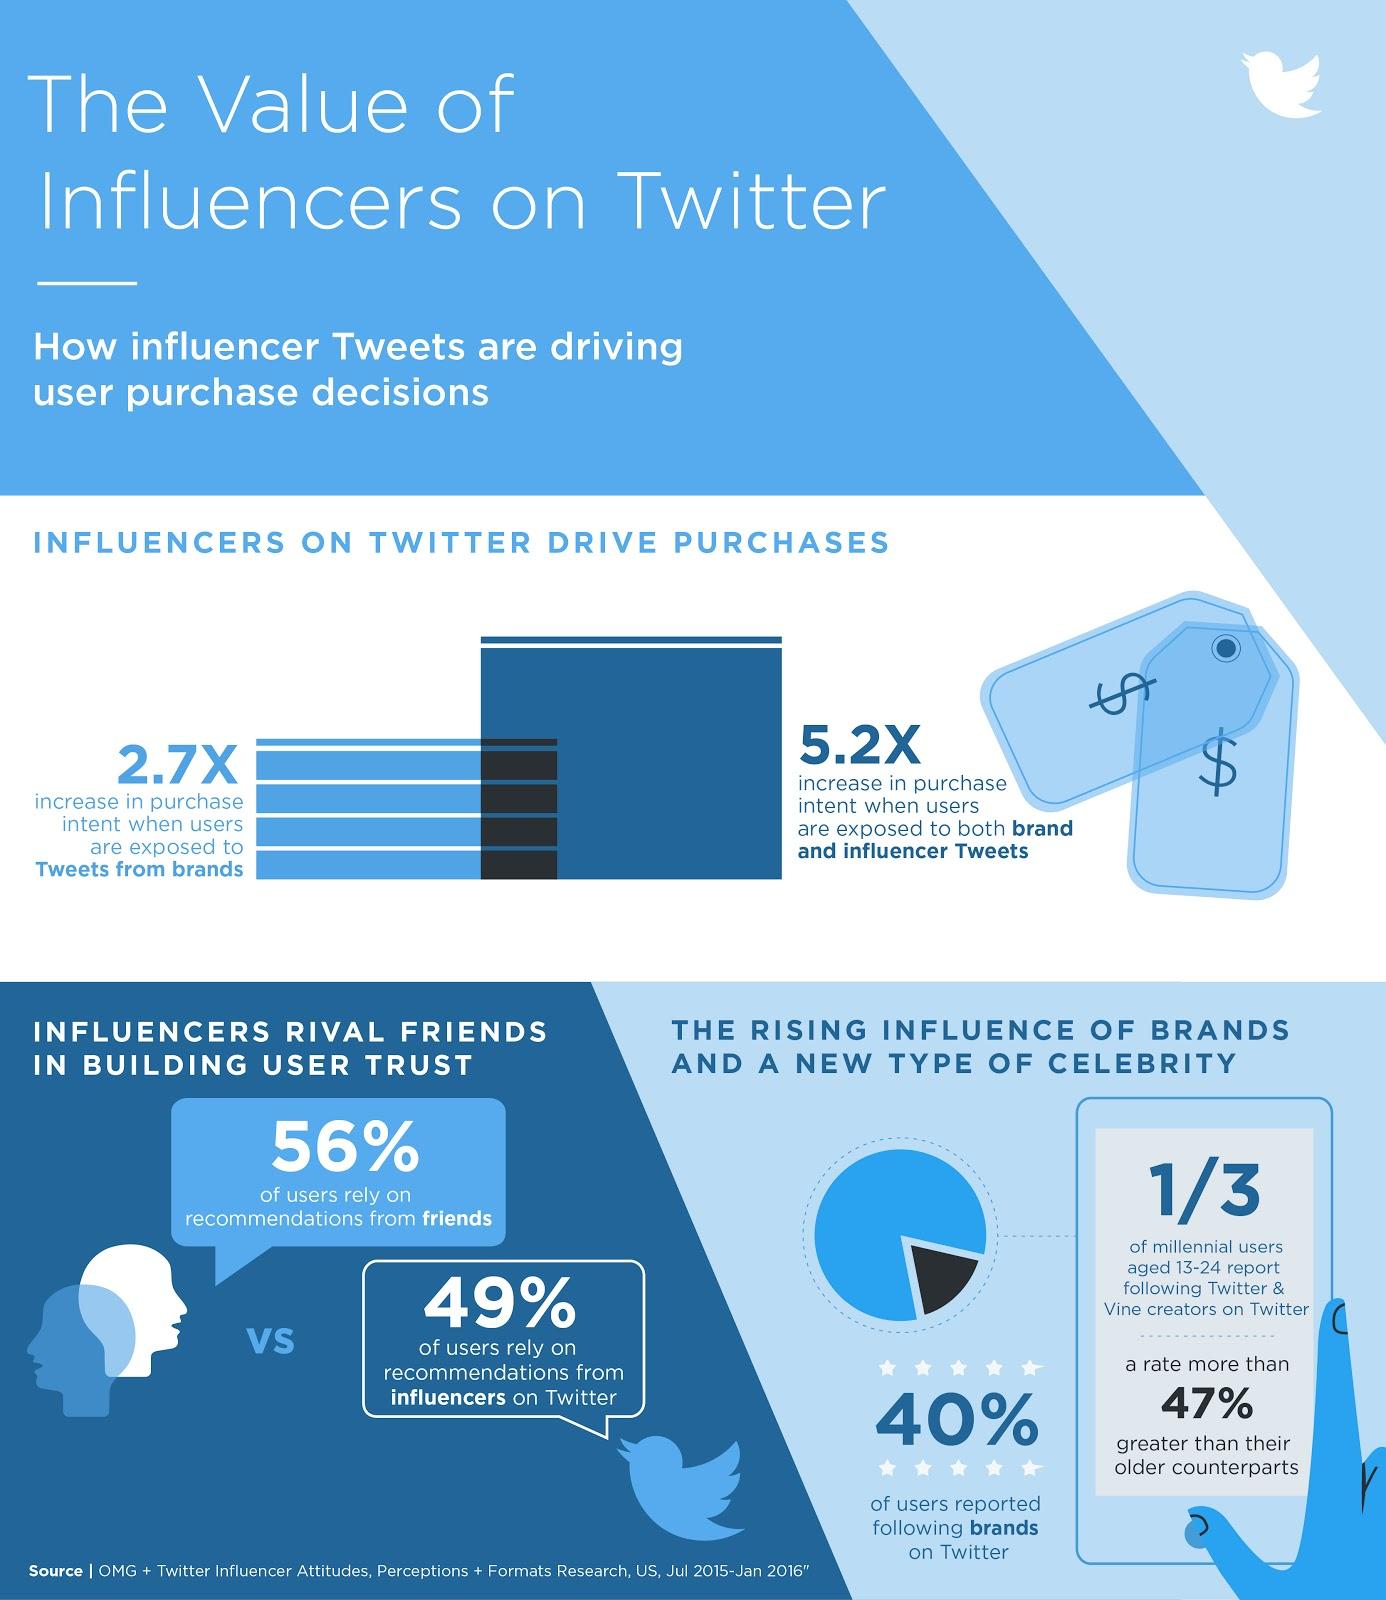 influencer-quanto-valgono-su-twitter